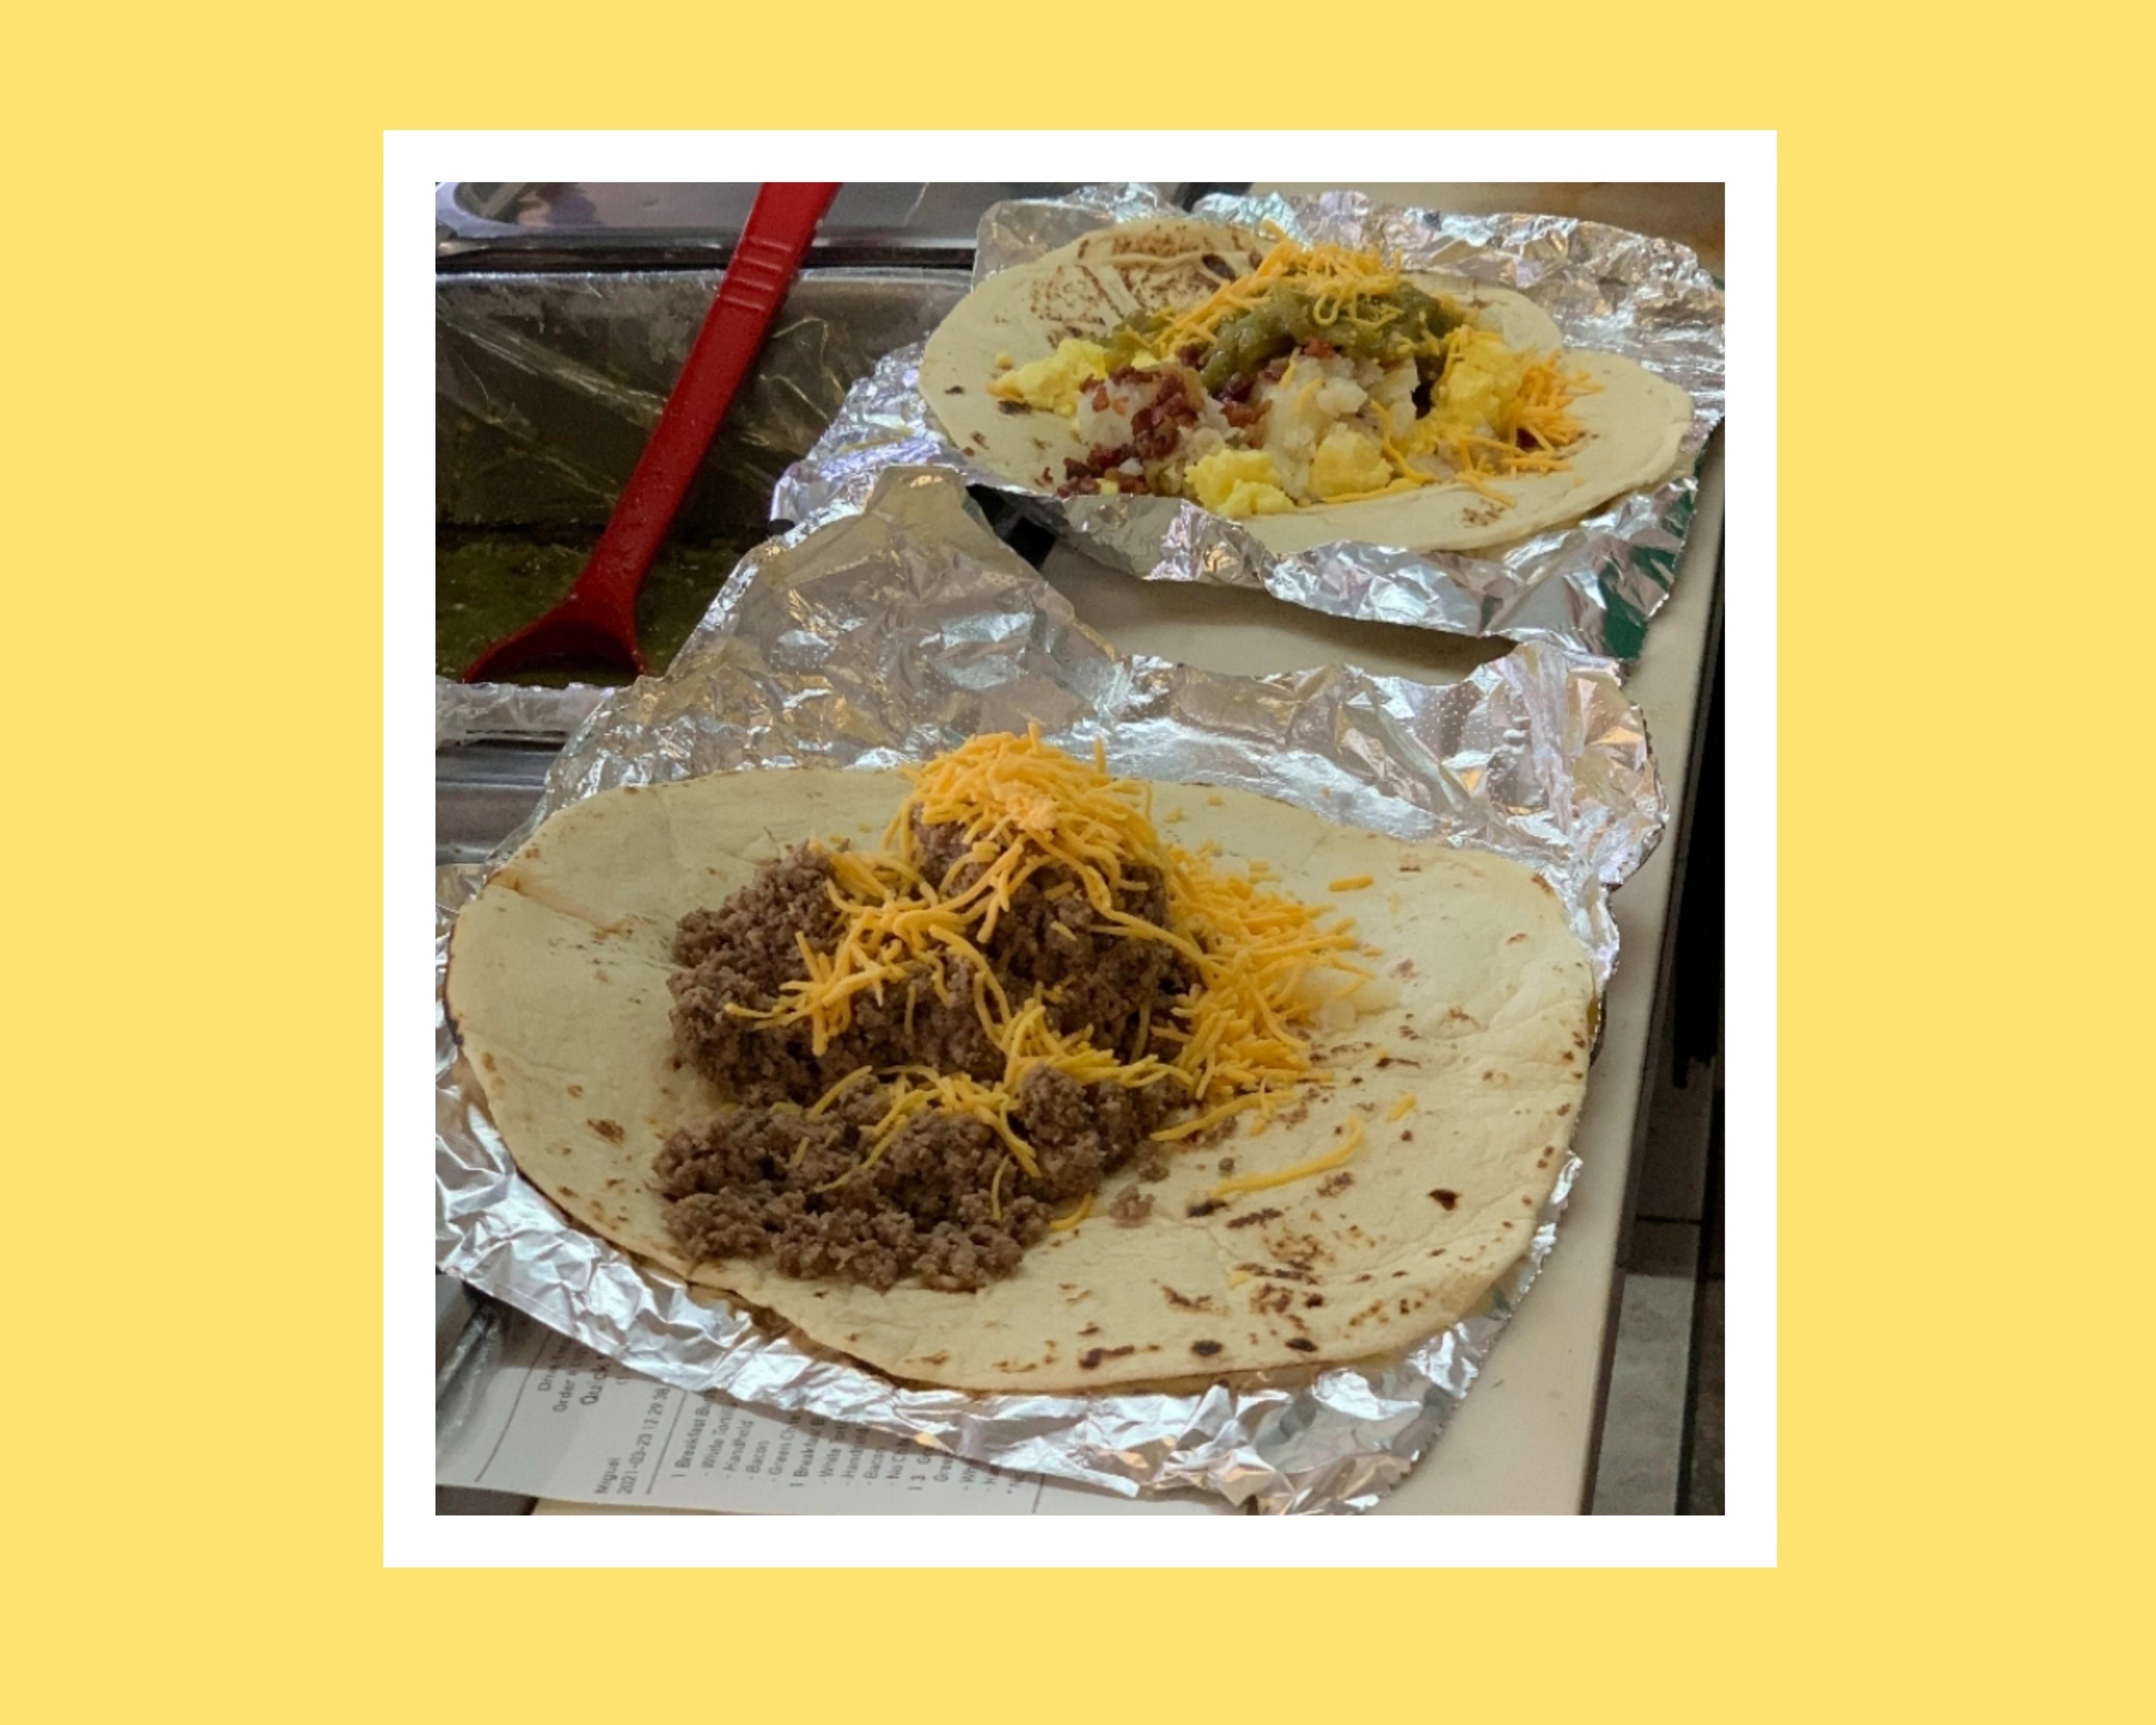 Photo of Build Your Own Burrito